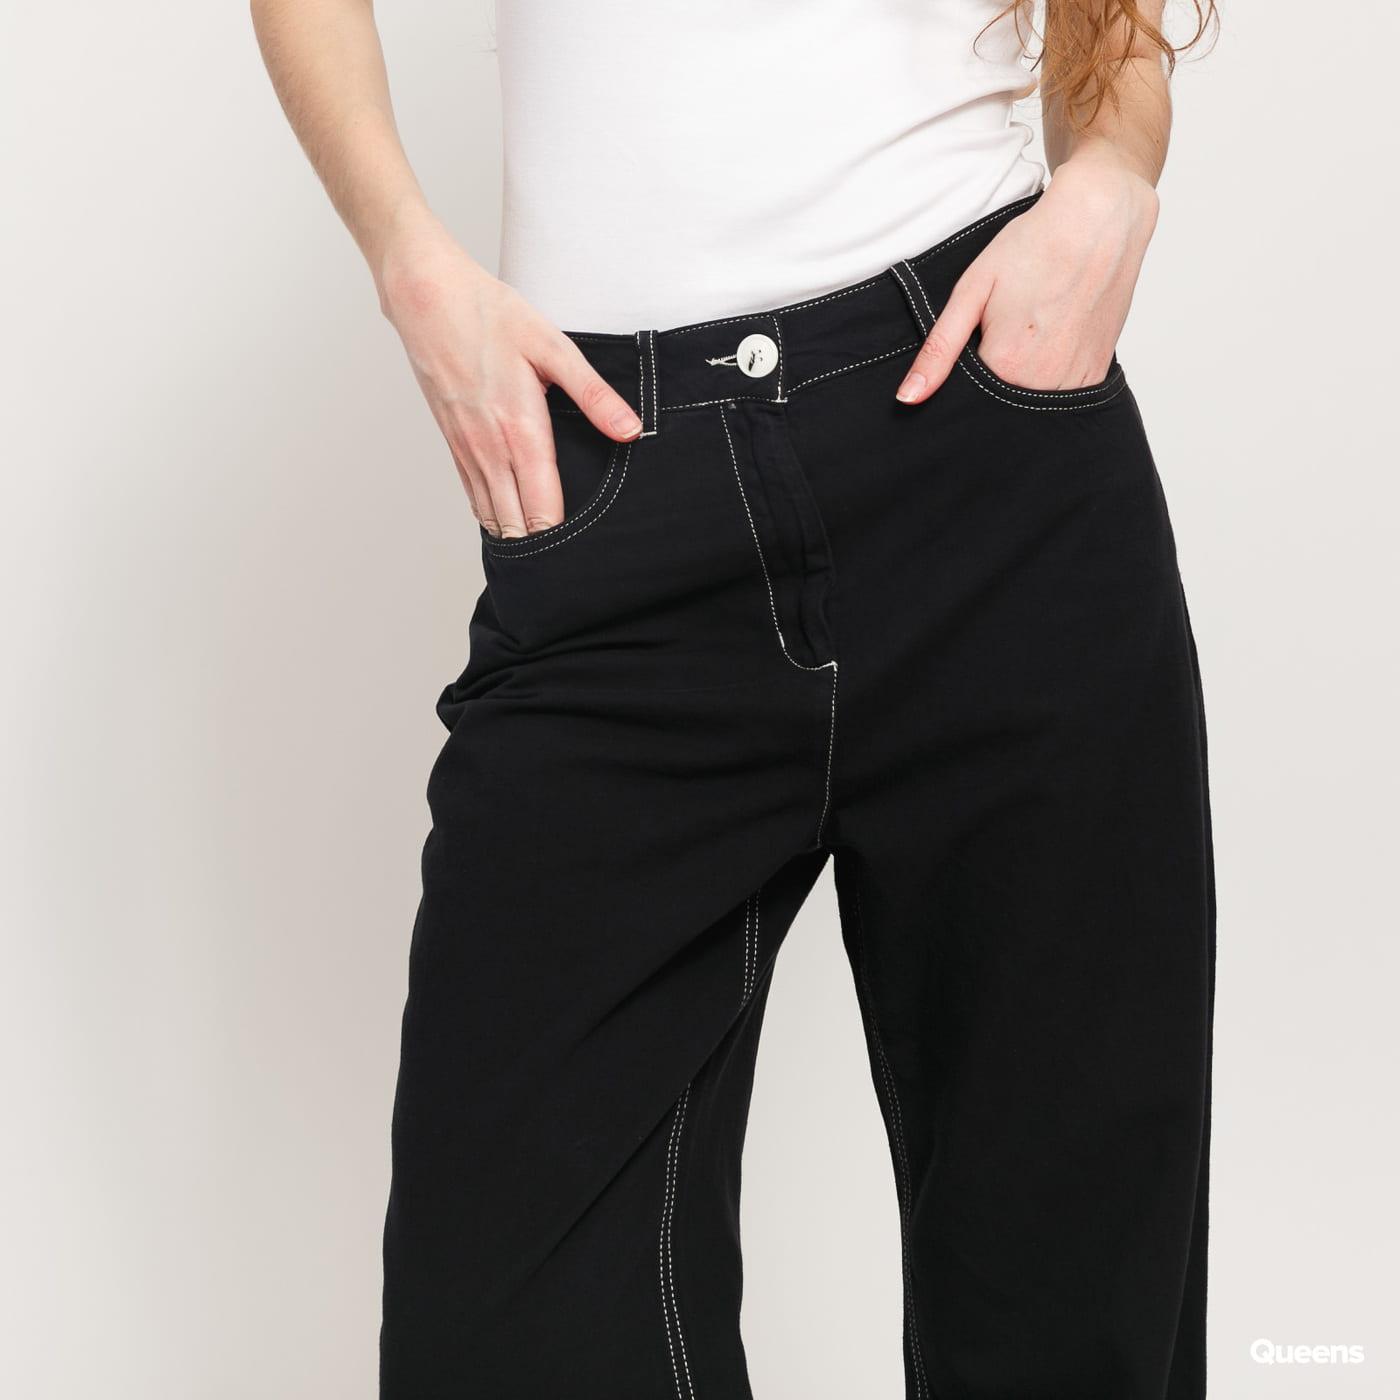 WOOD WOOD Althea Trousers black